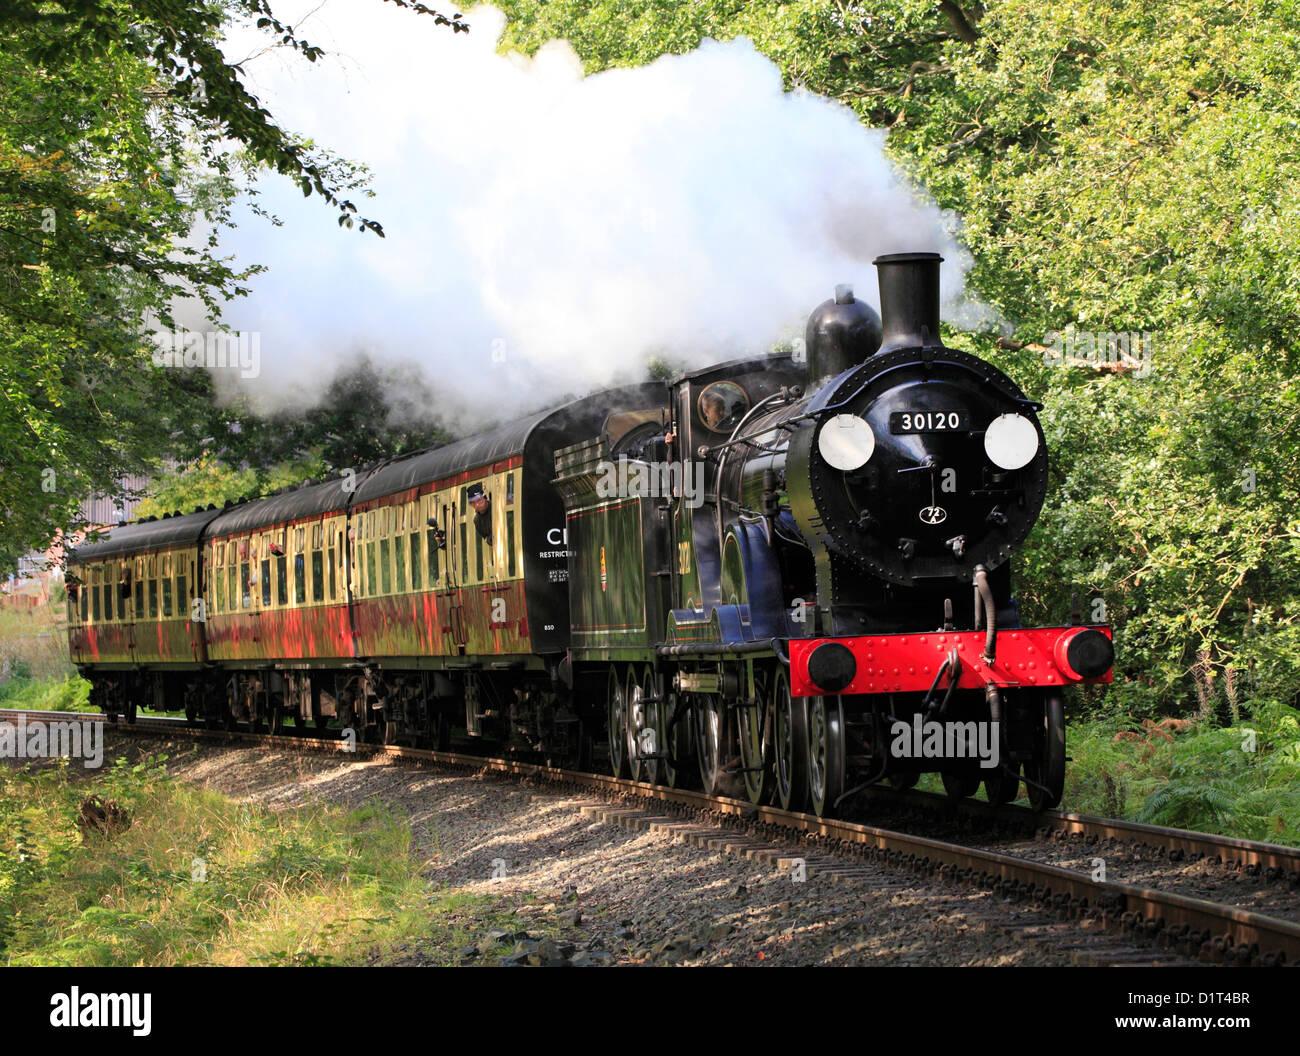 The Drummond T9 4-4-0 No. 30120 Locomotive steams through Trimpley, Severn Valley Railway - Stock Image